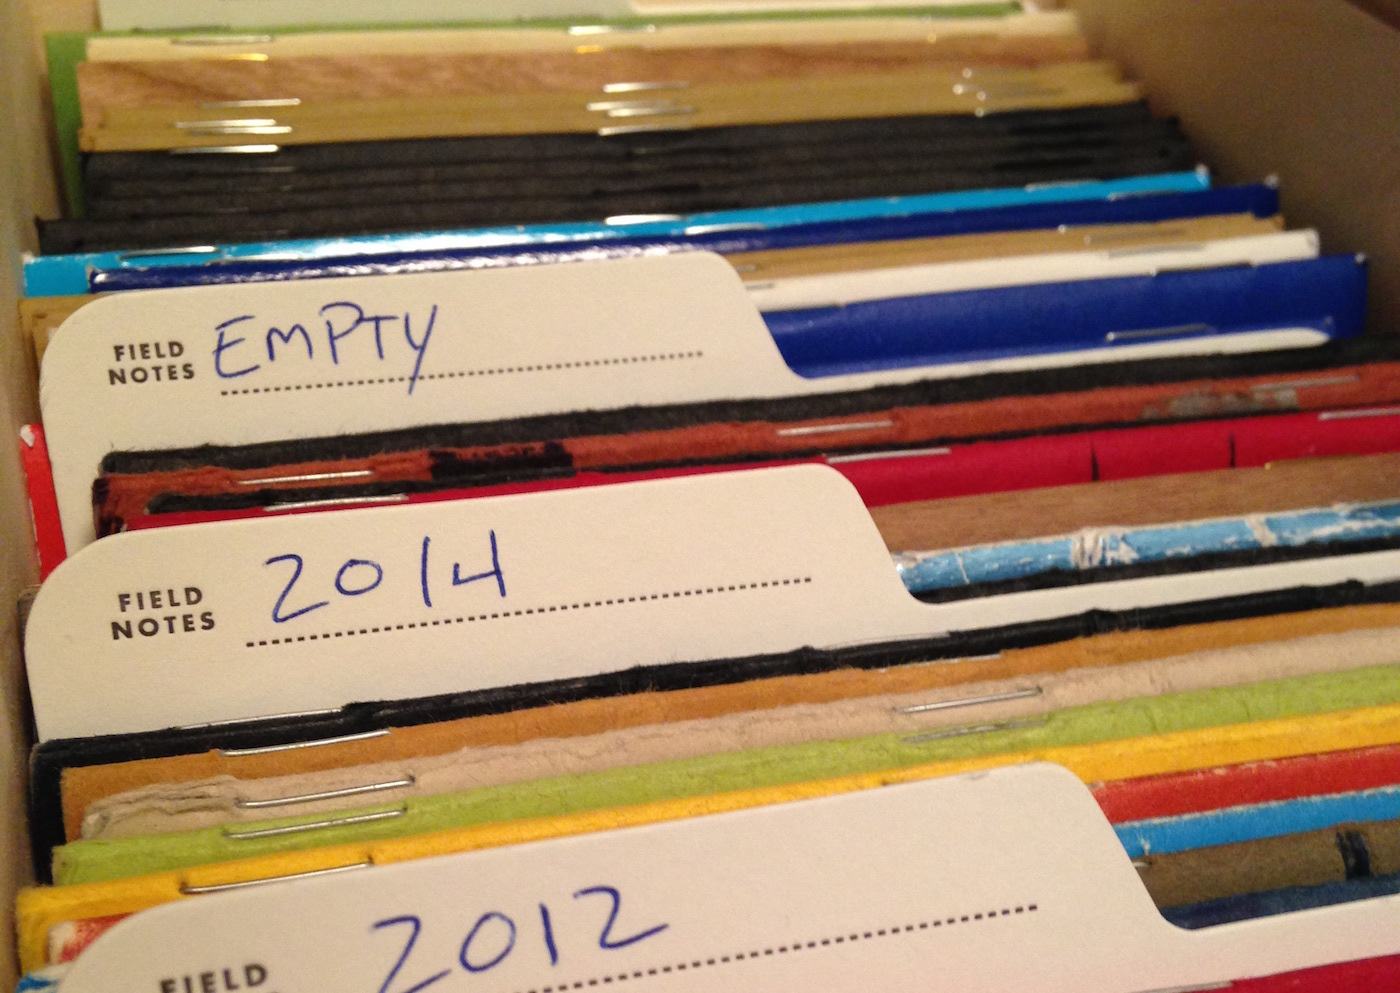 Stored notebooks